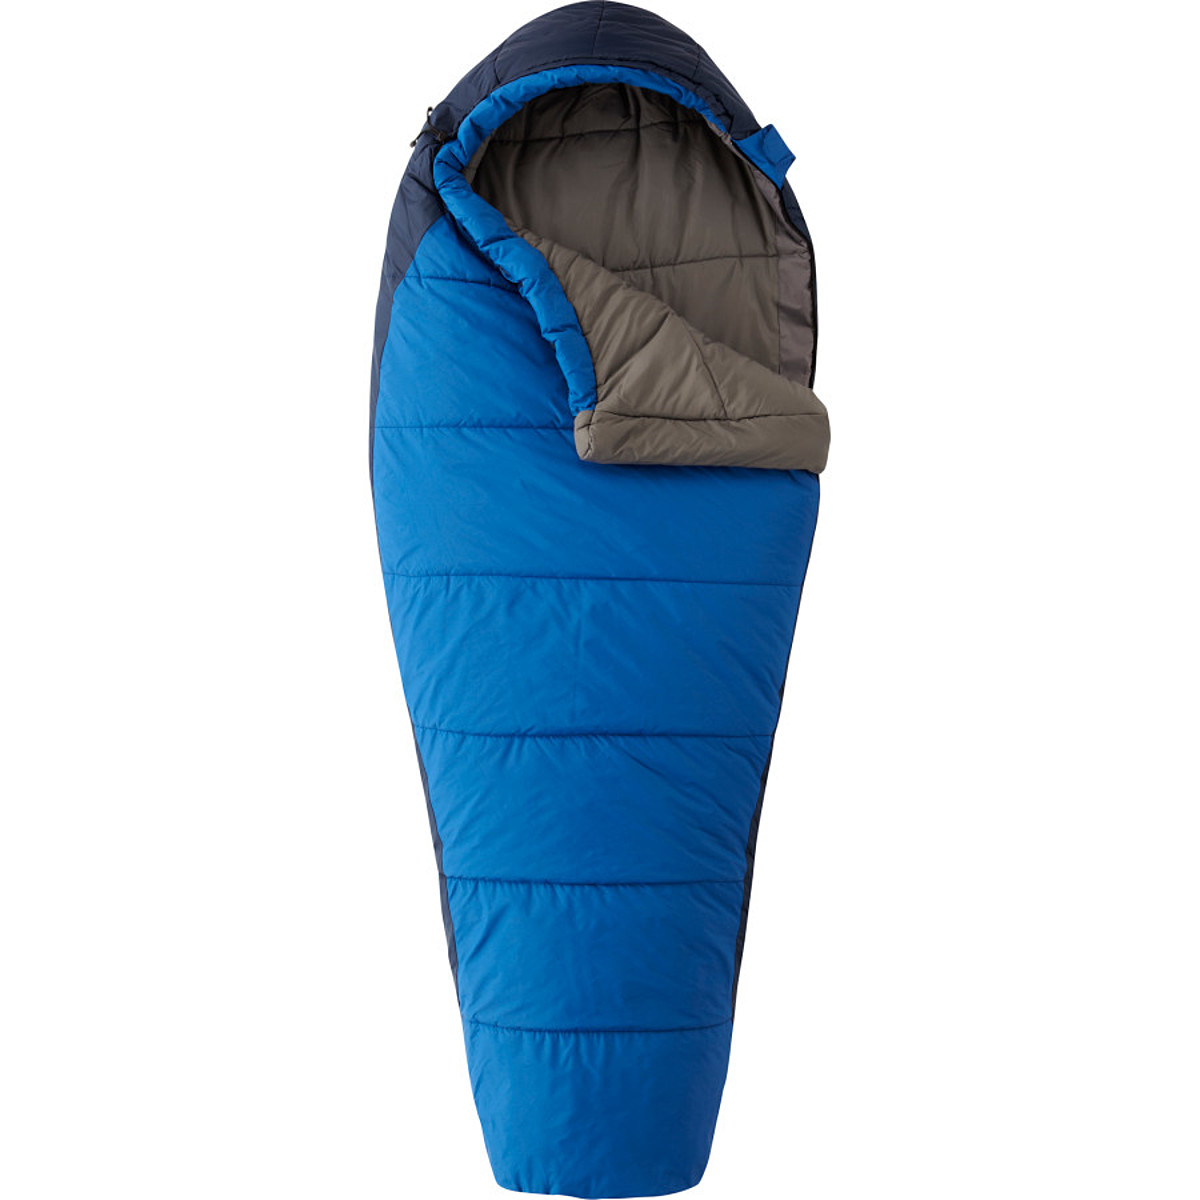 photo: Mountain Hardwear Mountain Goat 20° 3-season synthetic sleeping bag